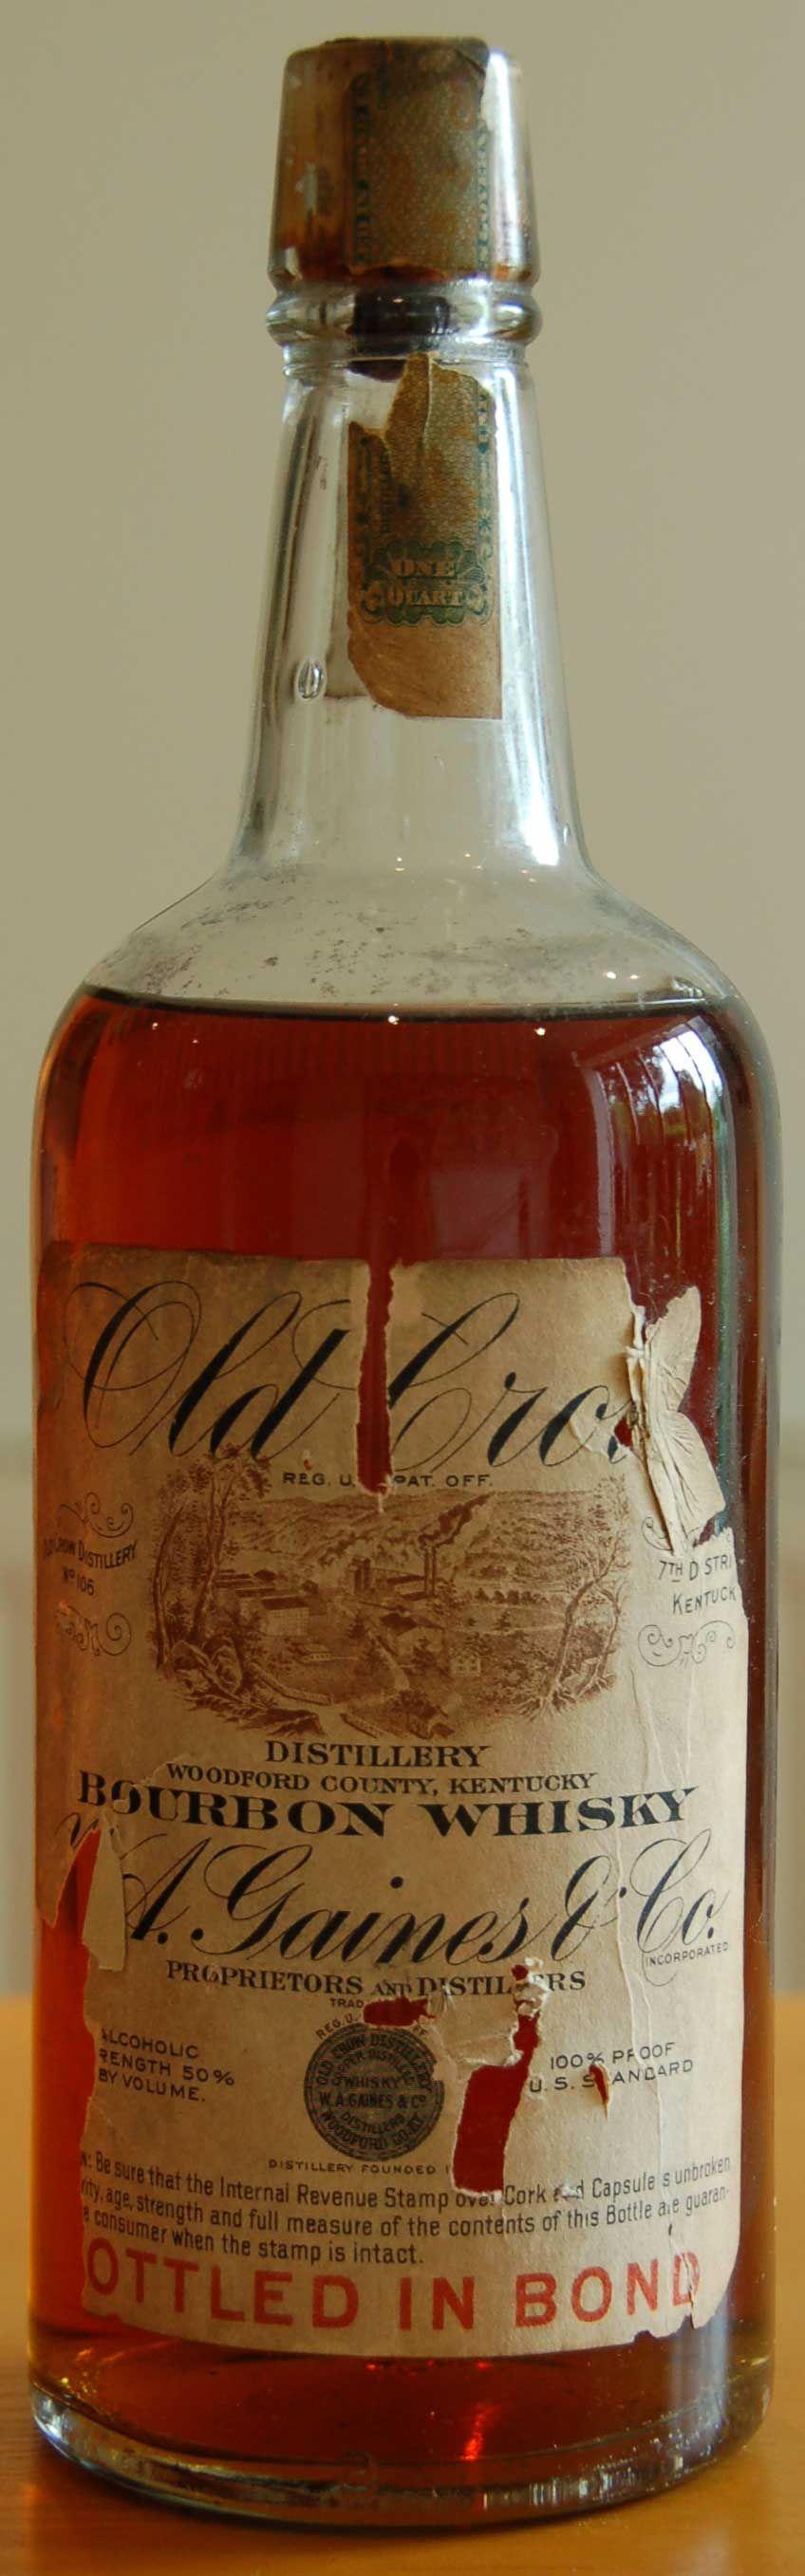 Pin By Alba 183 Sl 224 Inte Mhath On Bourbon 183 Rye 183 Whiskey